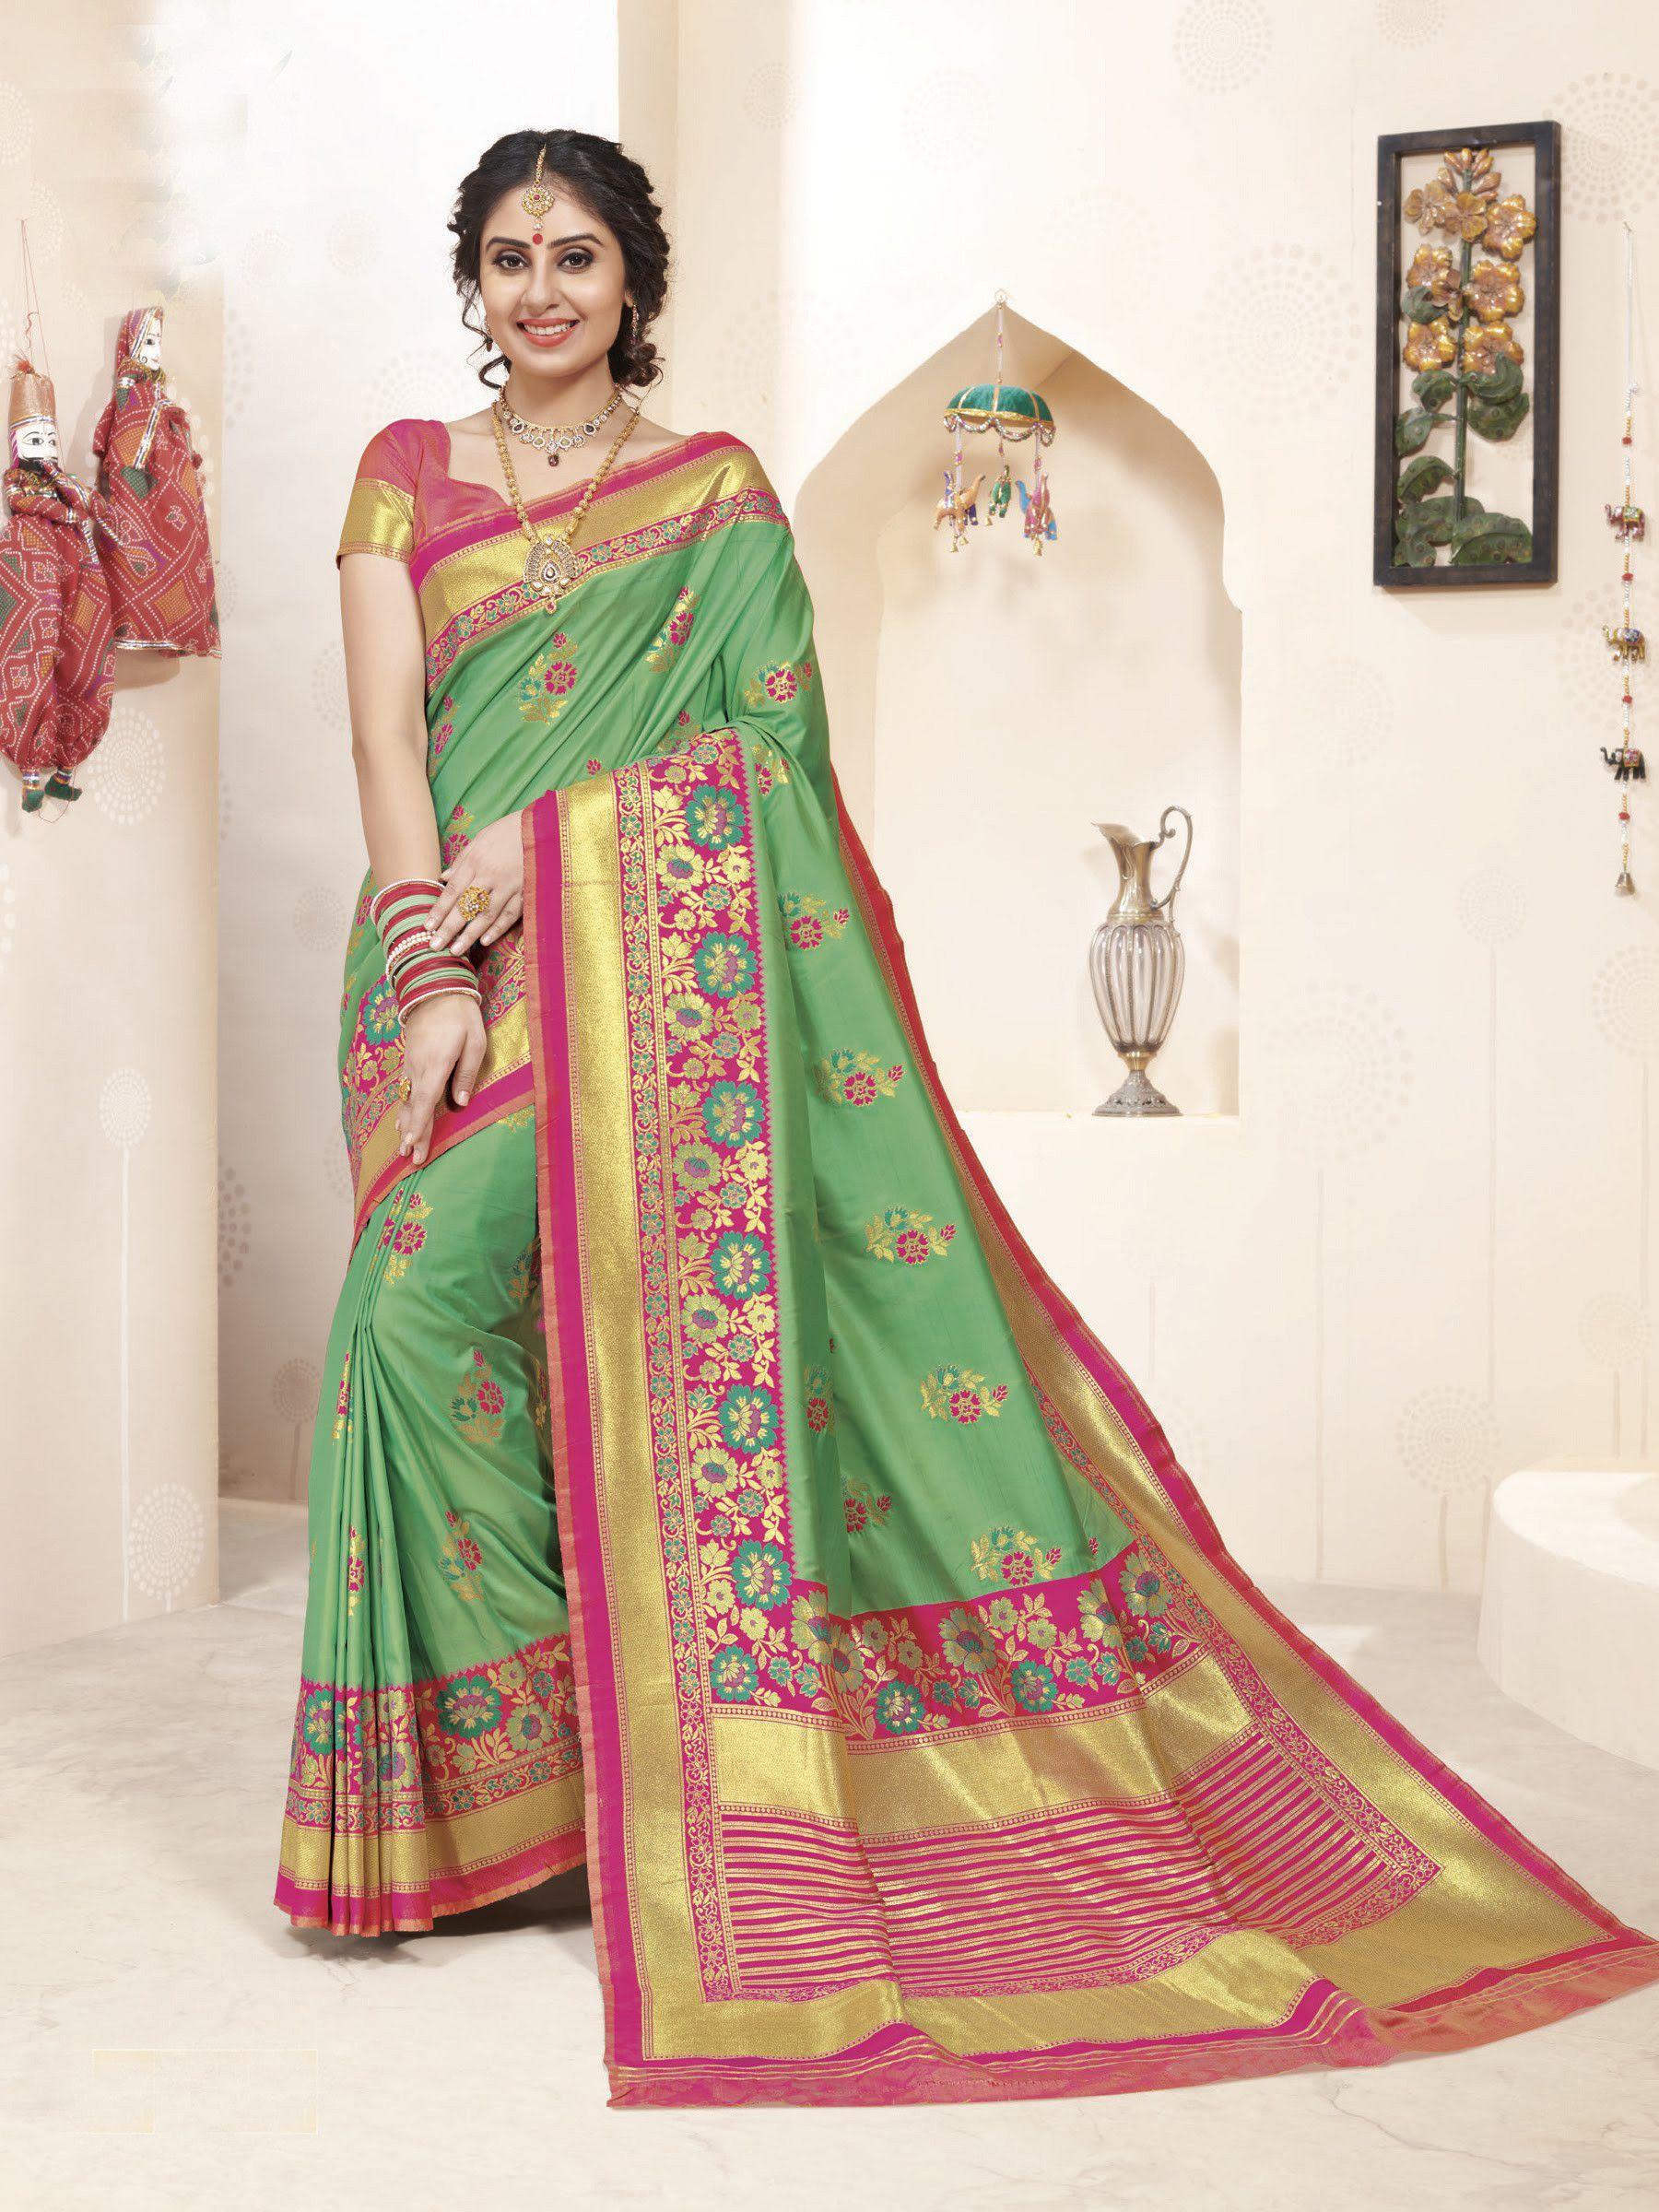 b9350f0cfd Buy online Sea Green with Pink colour designer heavy Banarasi silk saree at  joshindia